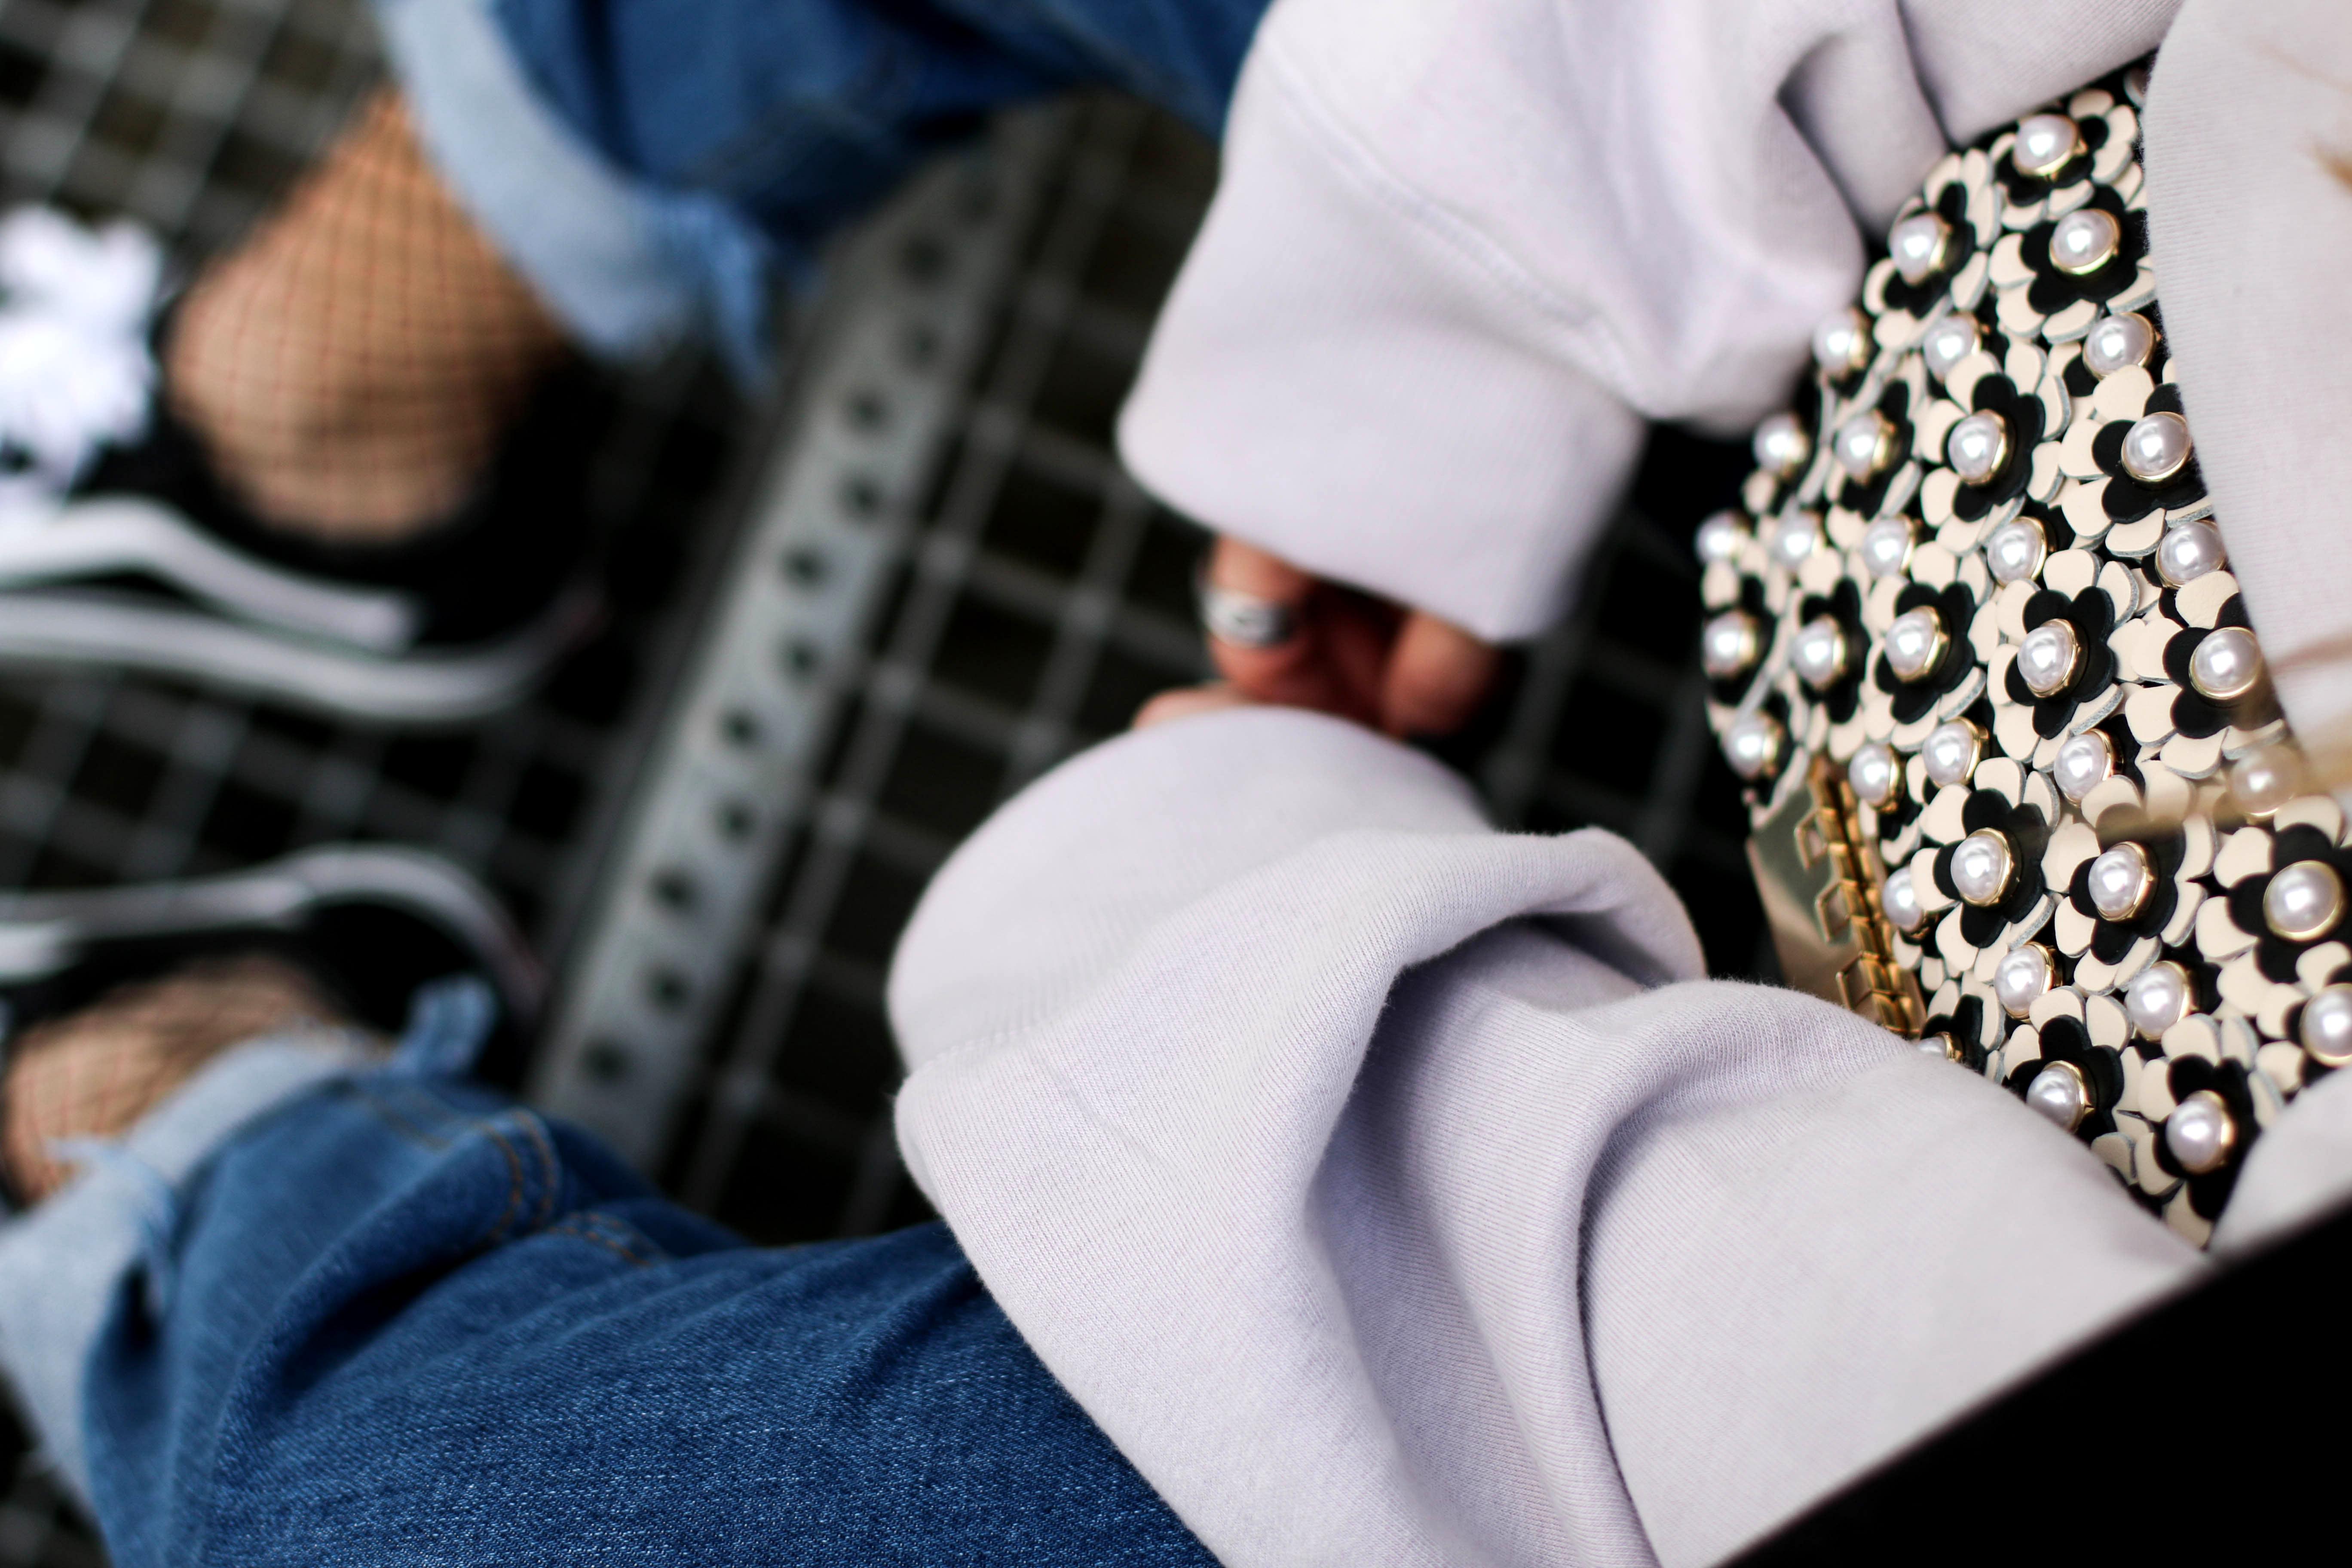 fishnets vans sneakers Zac Posen pearl bag